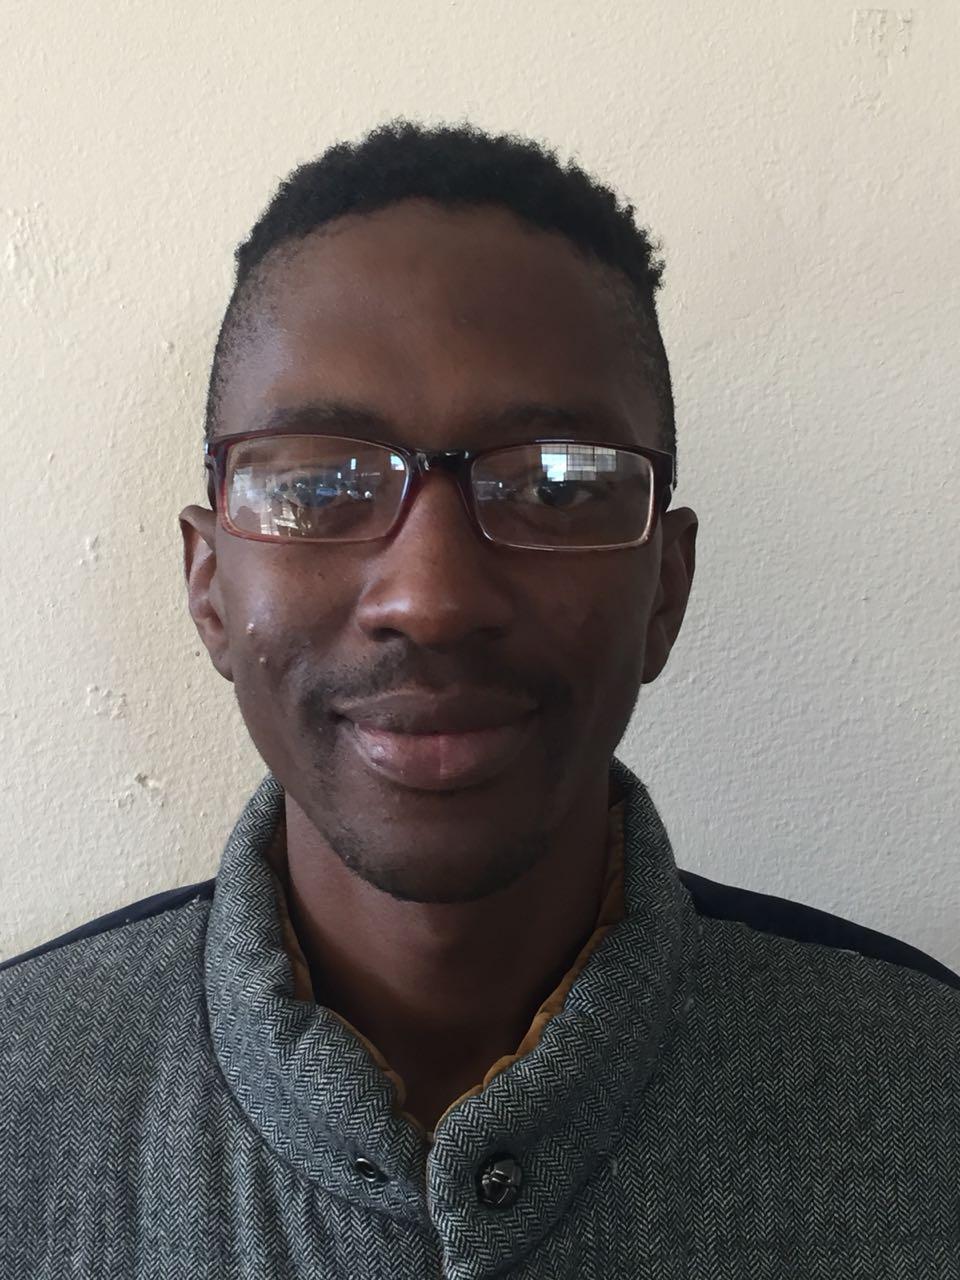 Ncapai Mawande